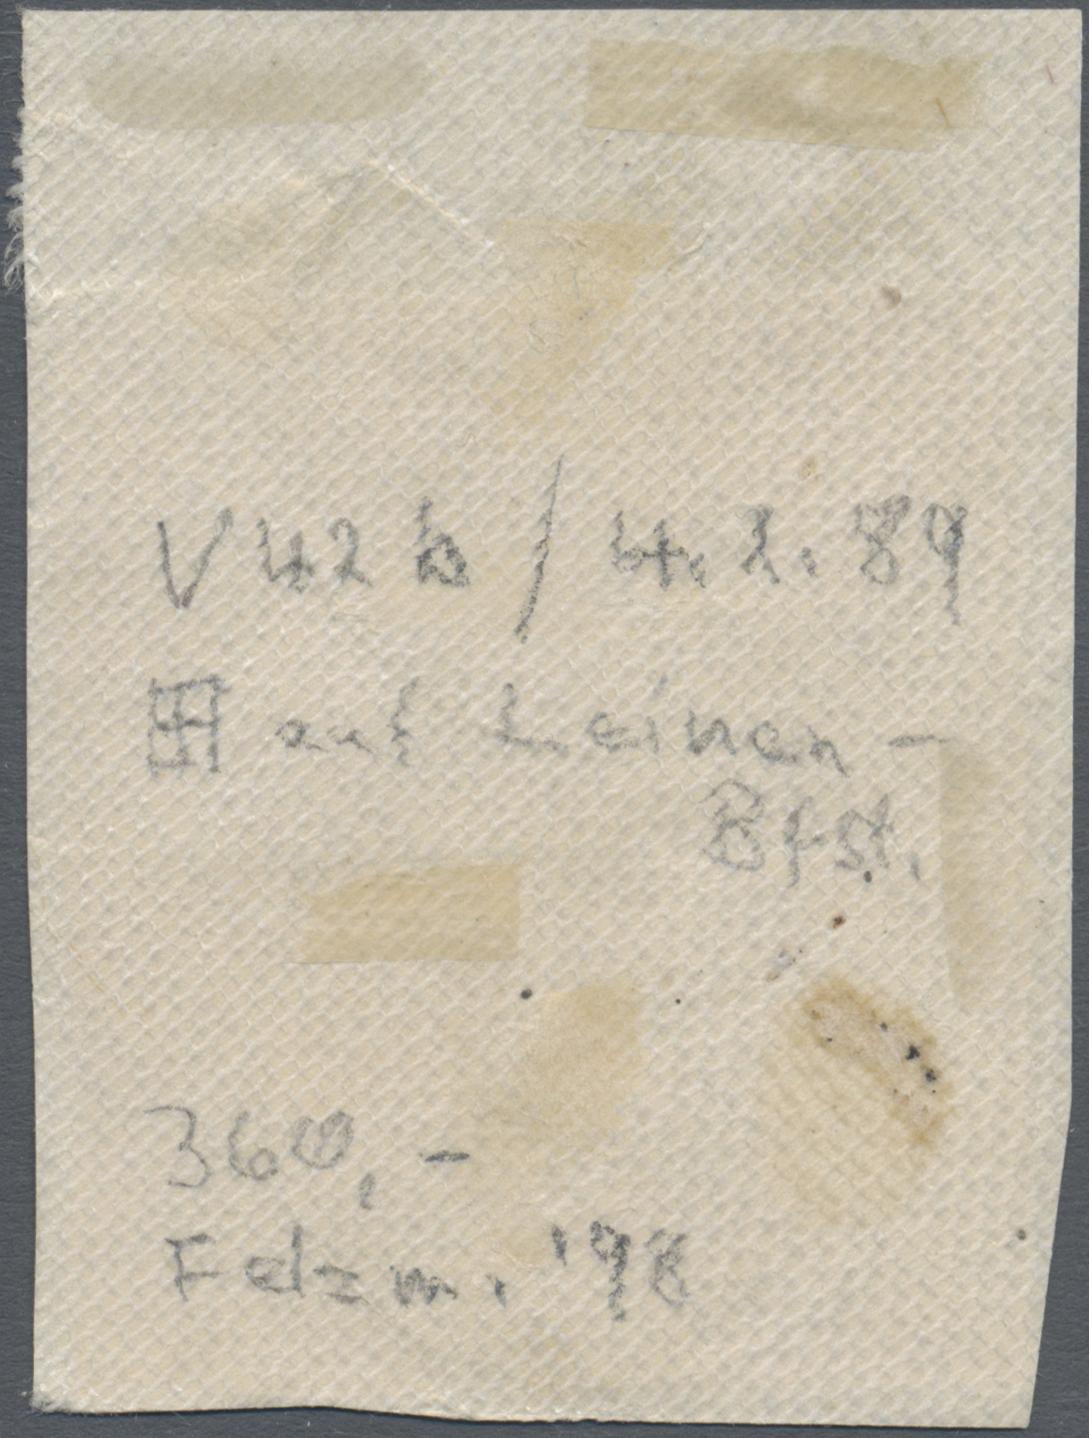 Lot 22857 - Deutsche Kolonien - Samoa - Vorläufer  -  Auktionshaus Christoph Gärtner GmbH & Co. KG Sale #44 Germany, Picture Post cards